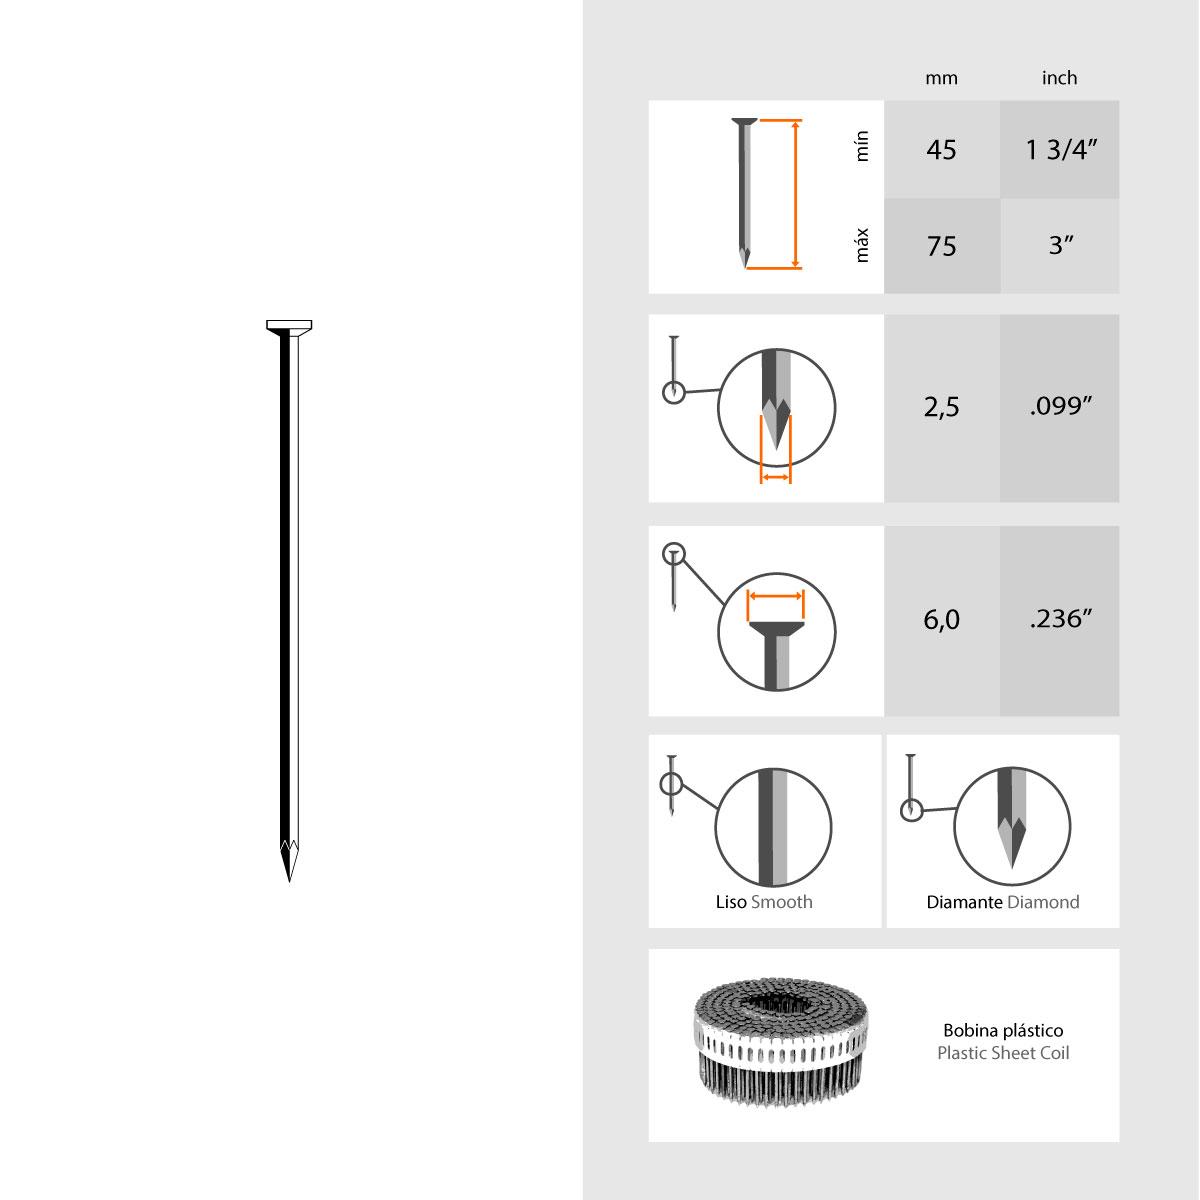 Clavo en bobina plástico Ø 2,5